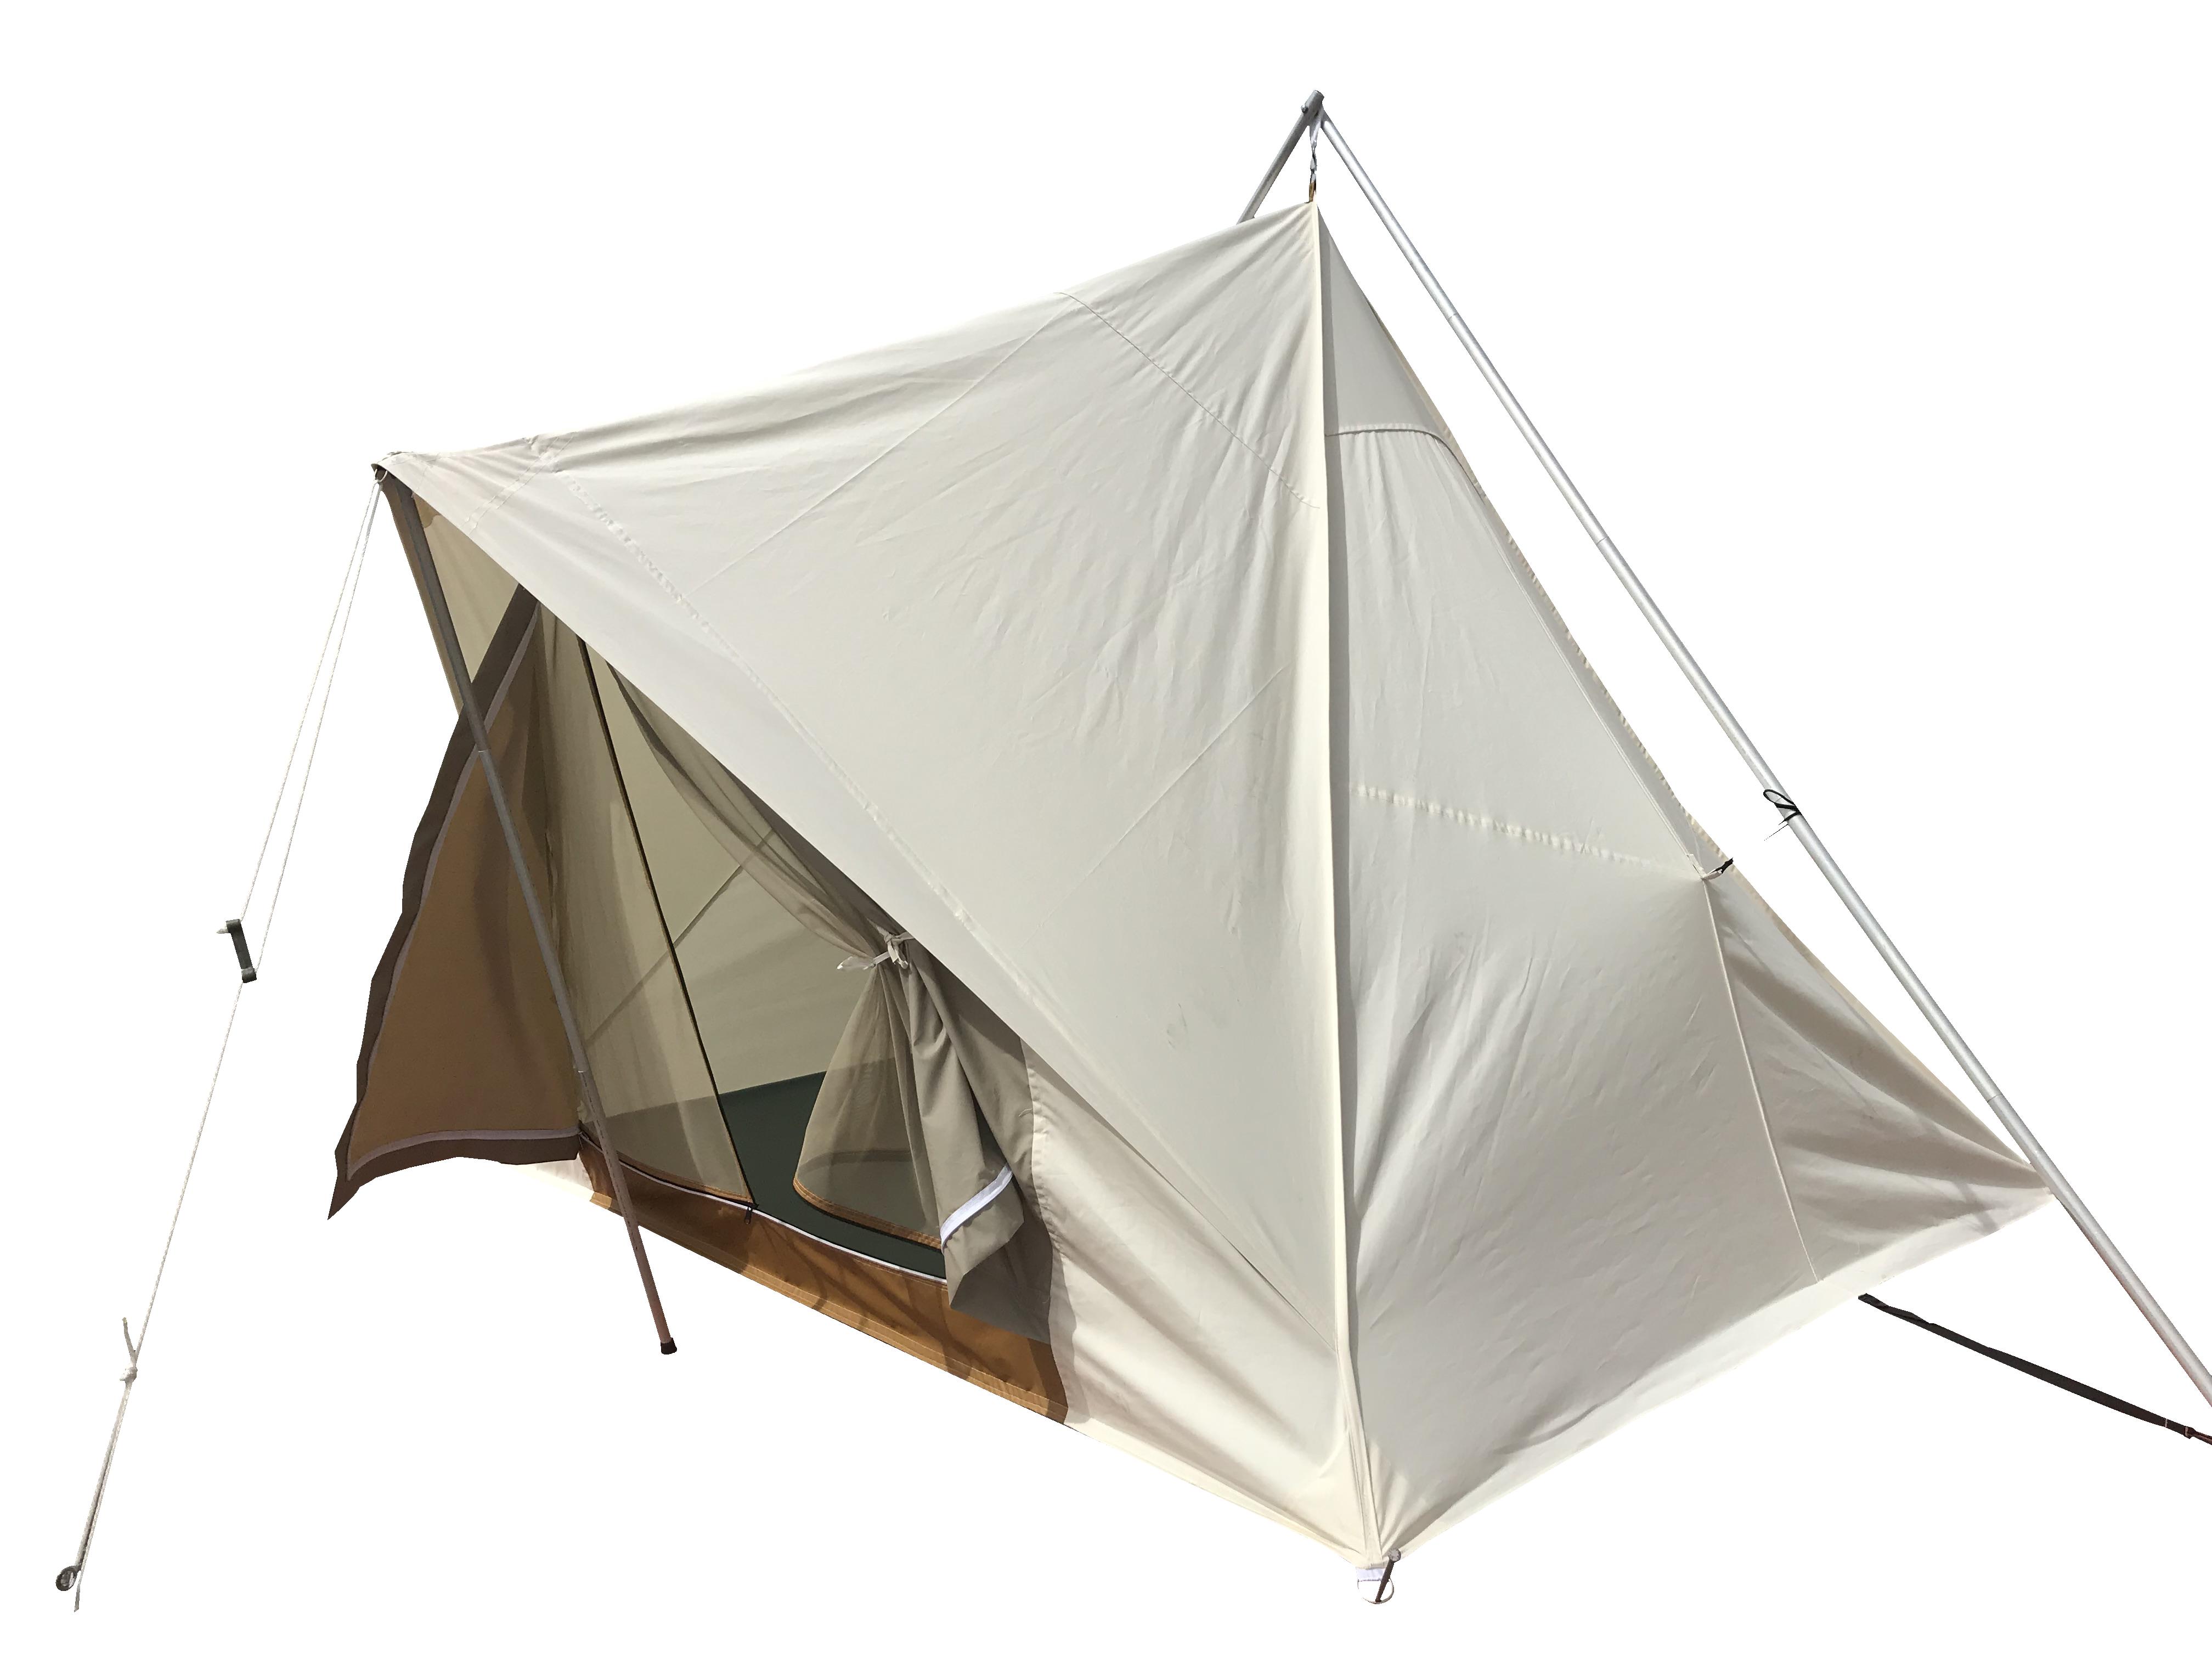 Clipart tent pyramid tent. Prairie ellis canvas tents